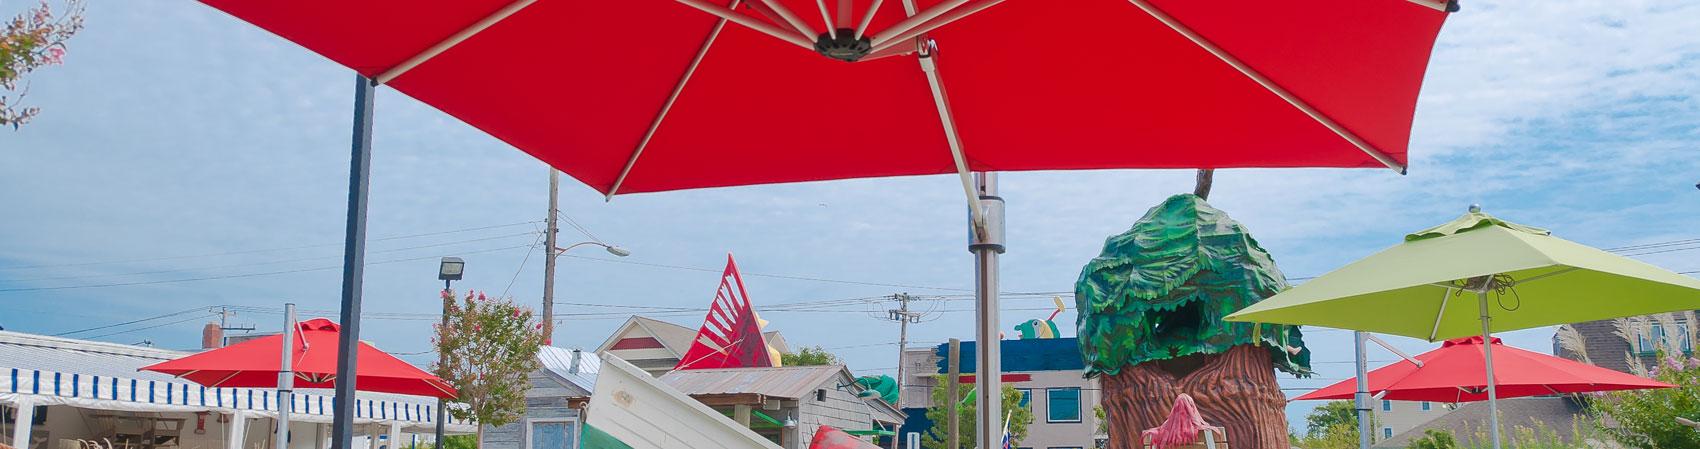 Frankford Recreation Umbrellas providing shade for a recreational mini golf course